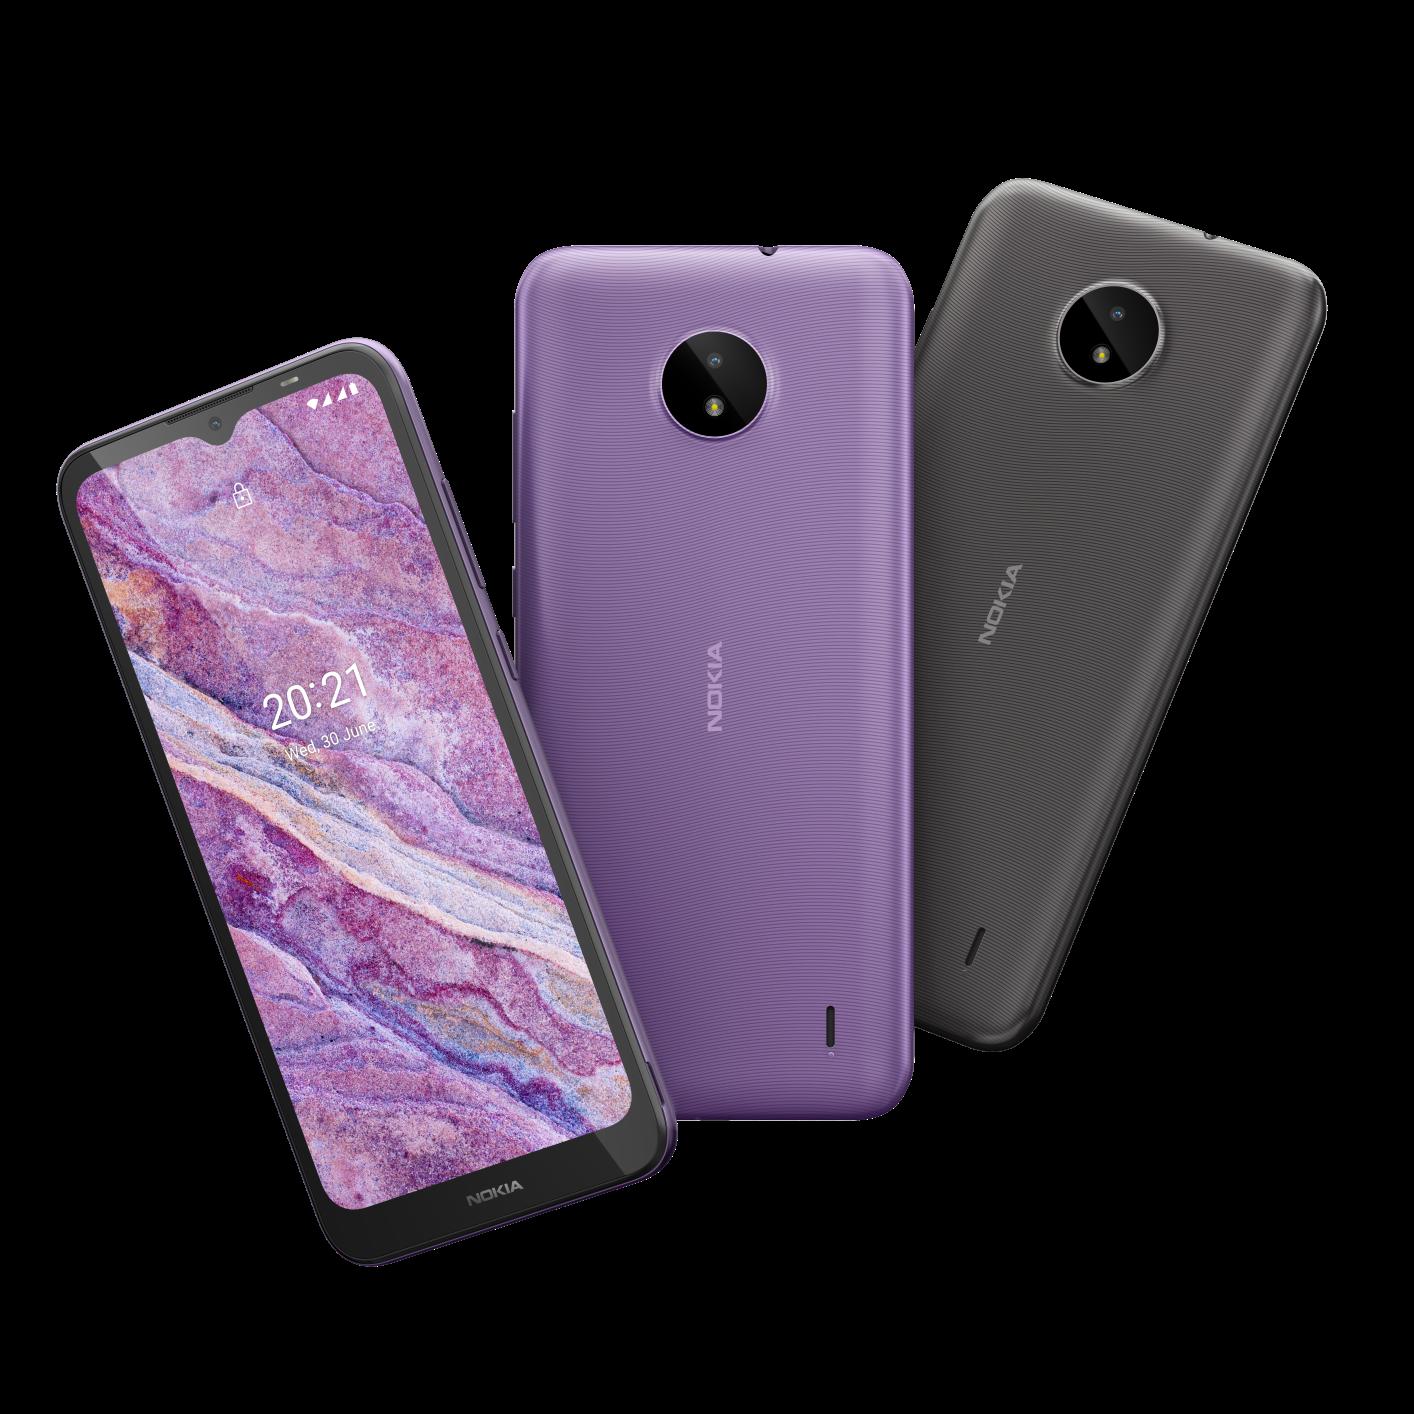 Nokia C10 ใหม่ สมาร์ทโฟนที่ทุกคนเข้าถึงได้ จอใหญ่ใครก็รัก